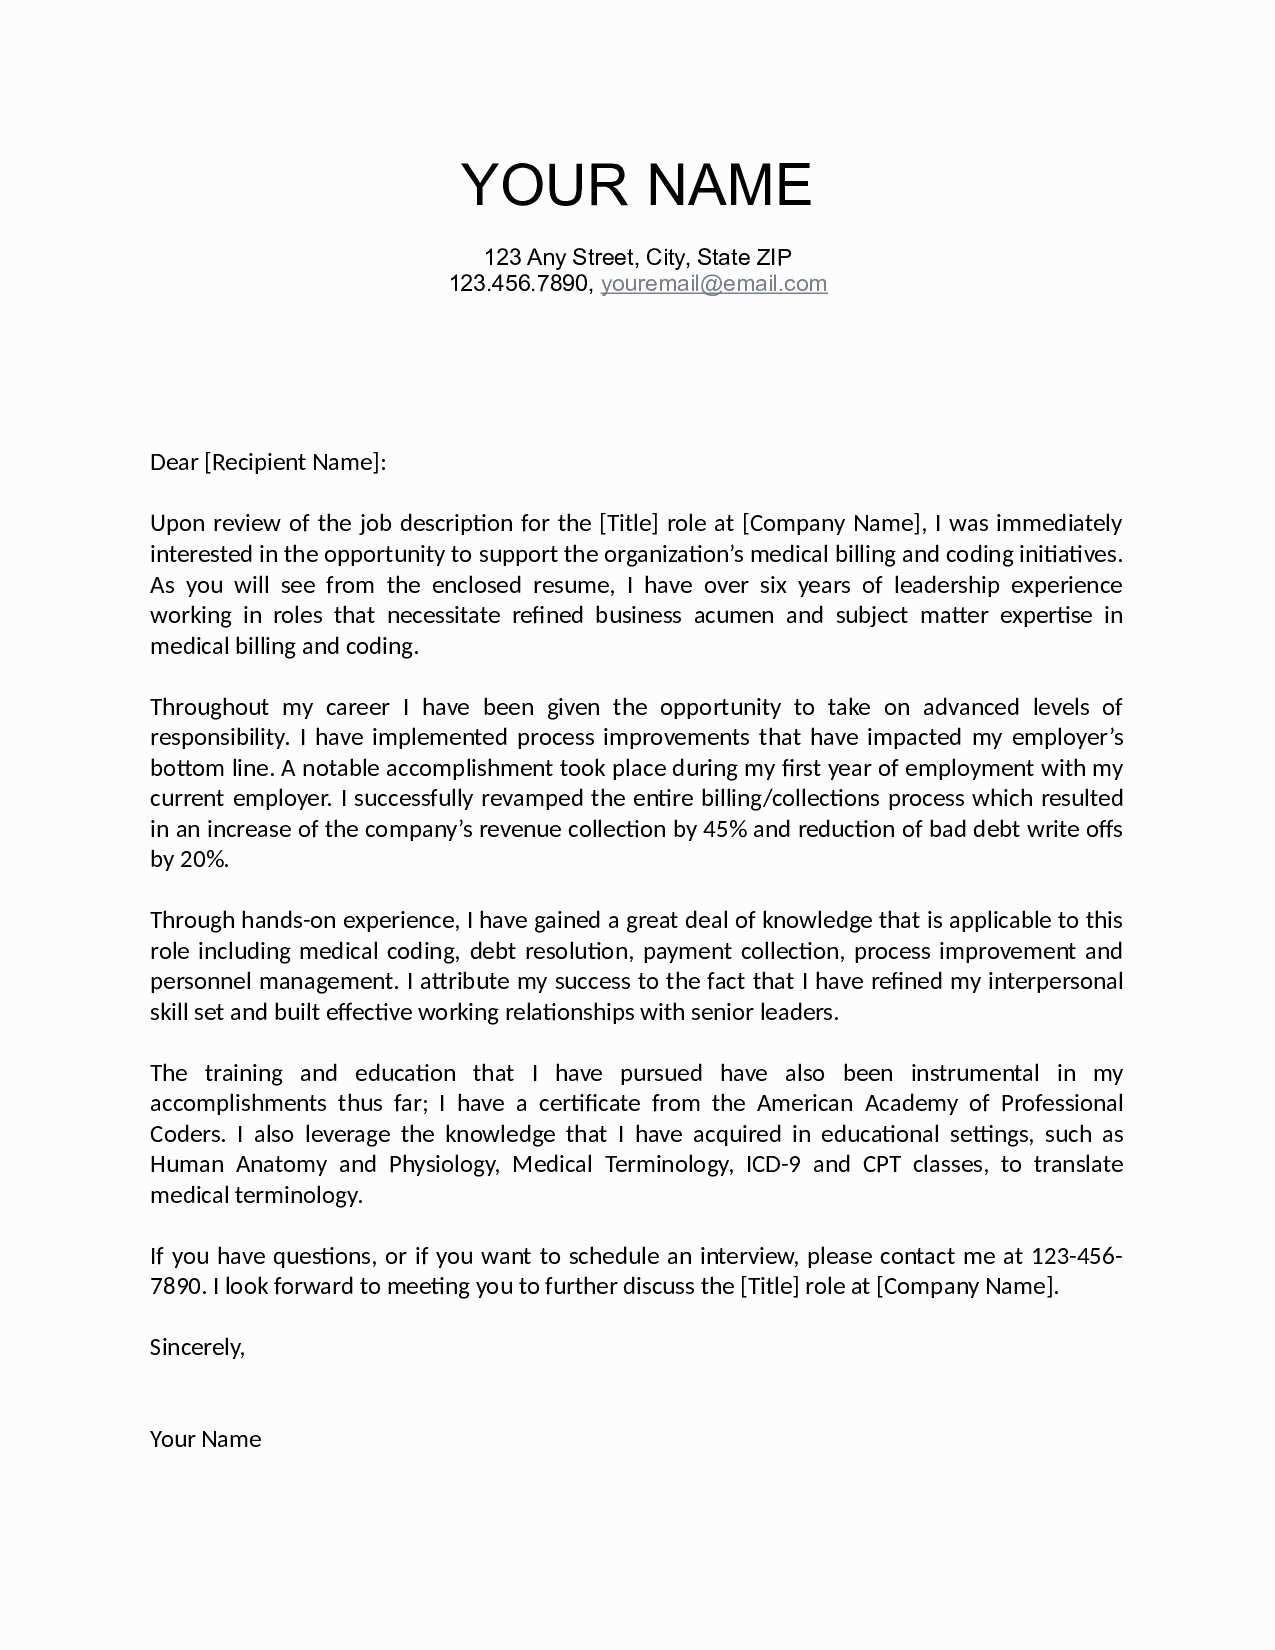 Final Demand Letter Template - Sample Demand Letter for Payment Debt Fresh Job Fer Letter